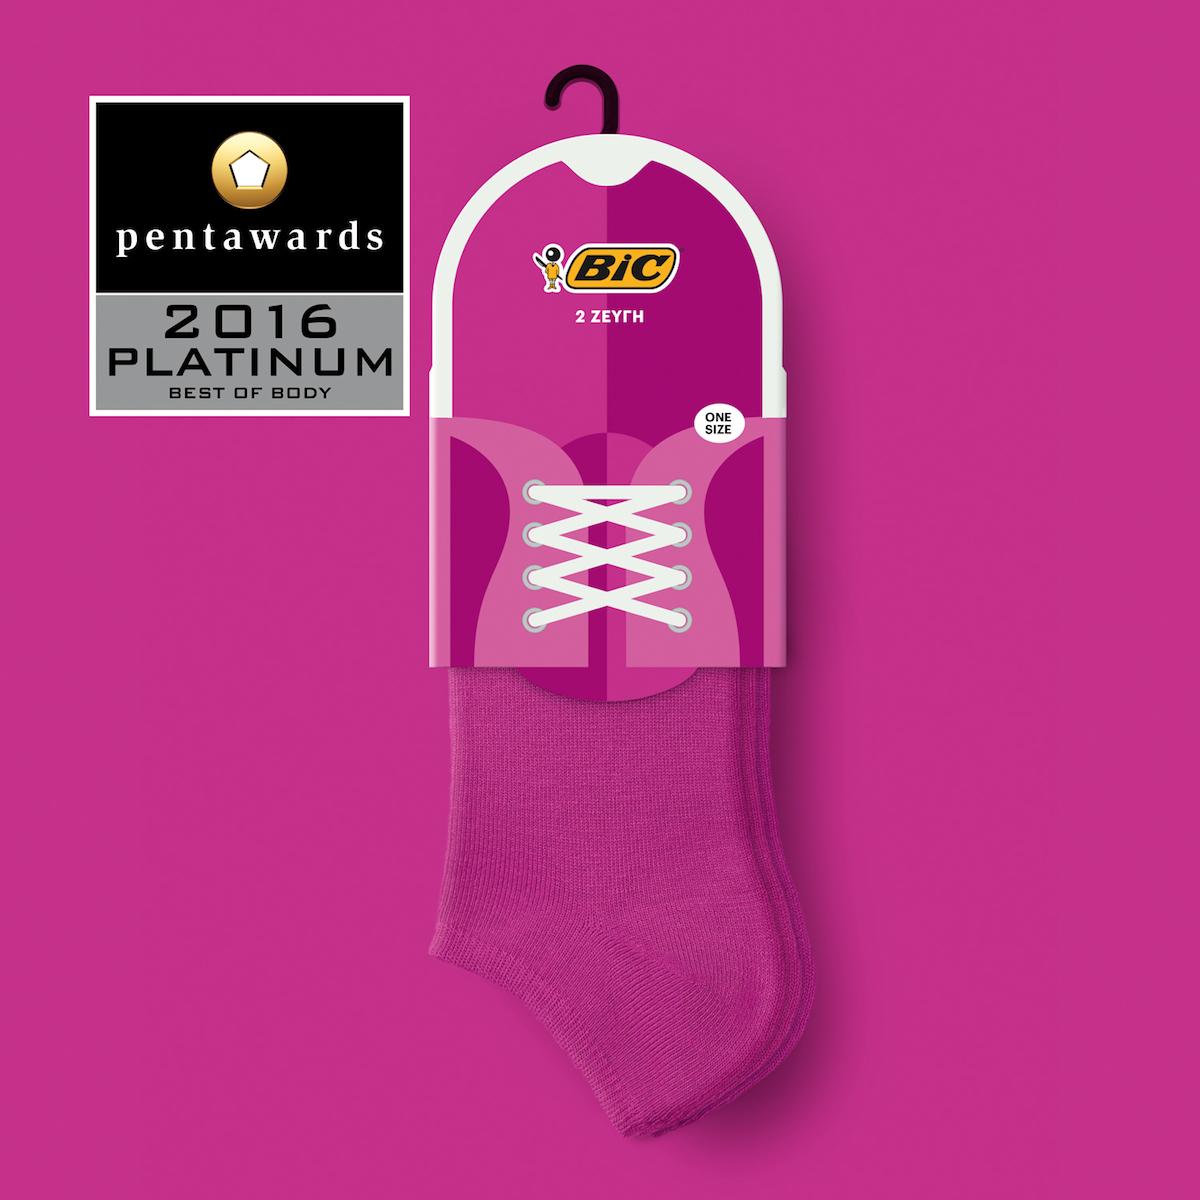 004-mousegraphics-bic-socks